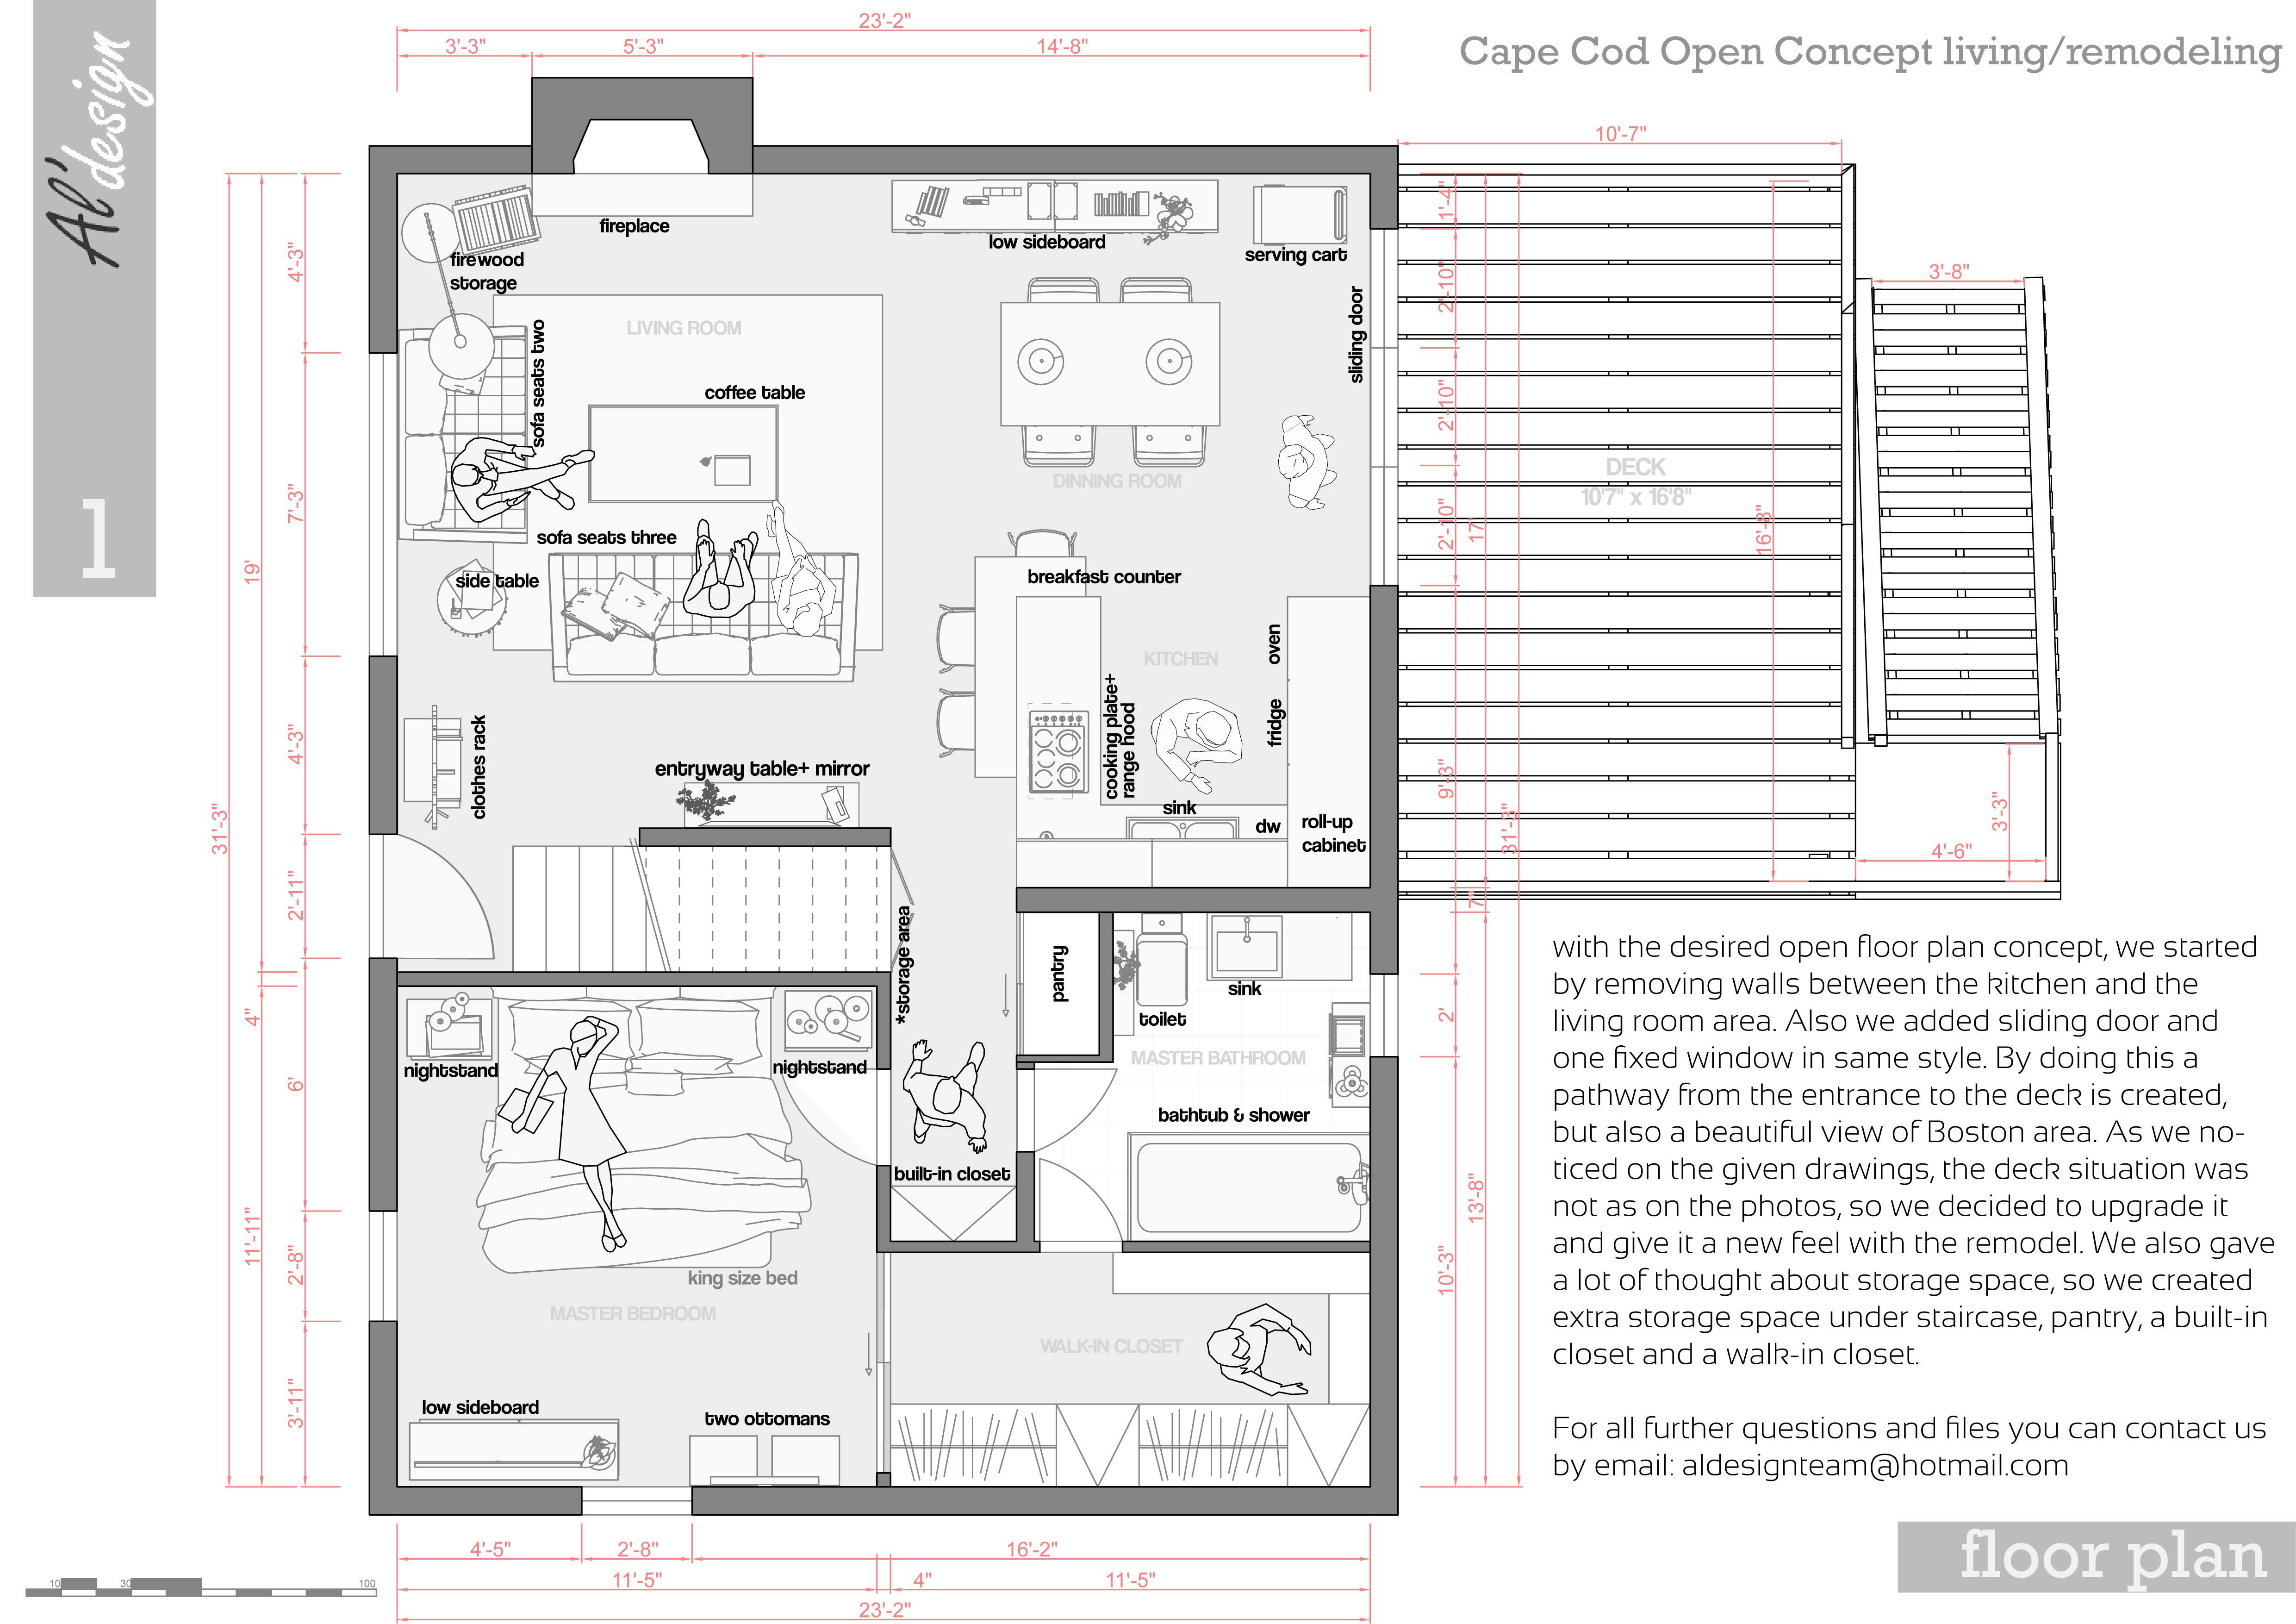 Entire Floor Design Project Designed By Al Design Team